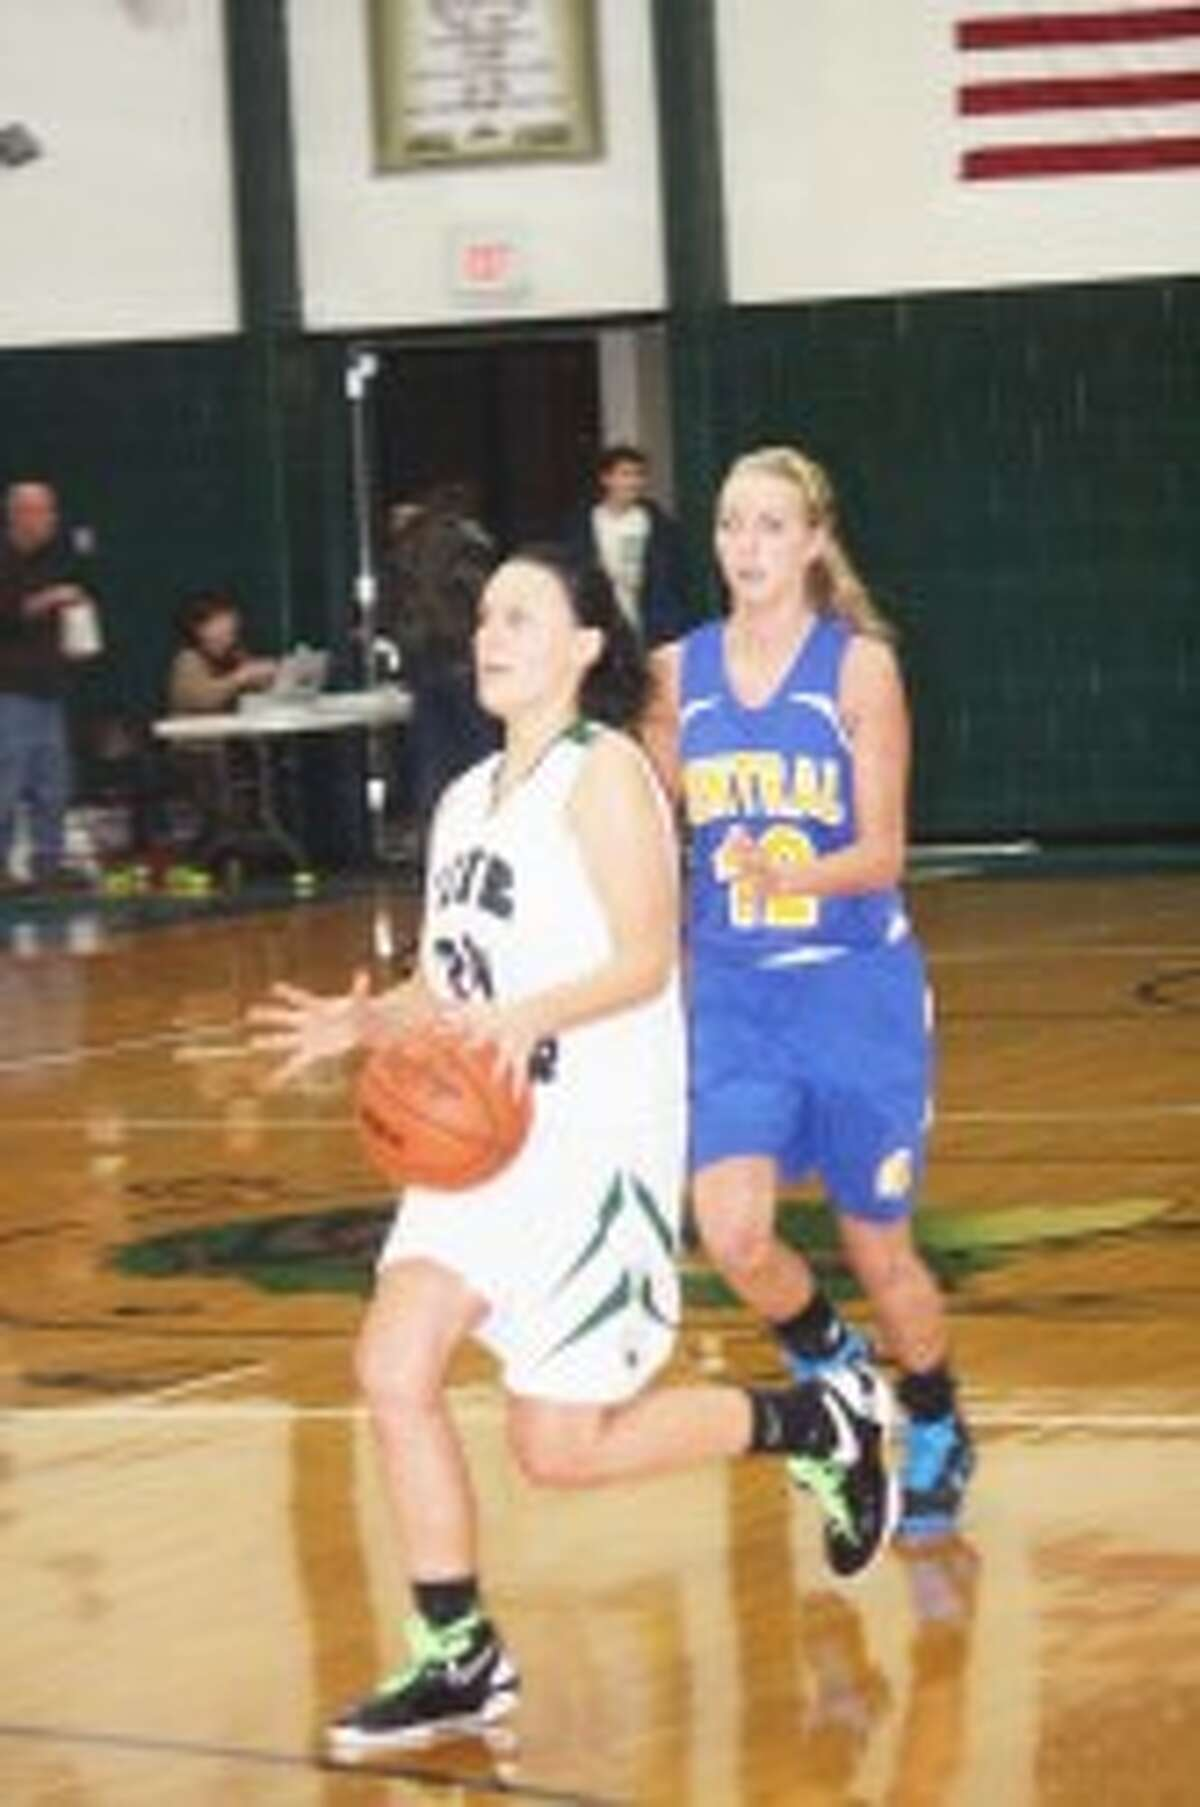 WINNING STREAK: Haley Raymond of Pine River takes the ball down the court. (Herald Review photos/John Raffel)